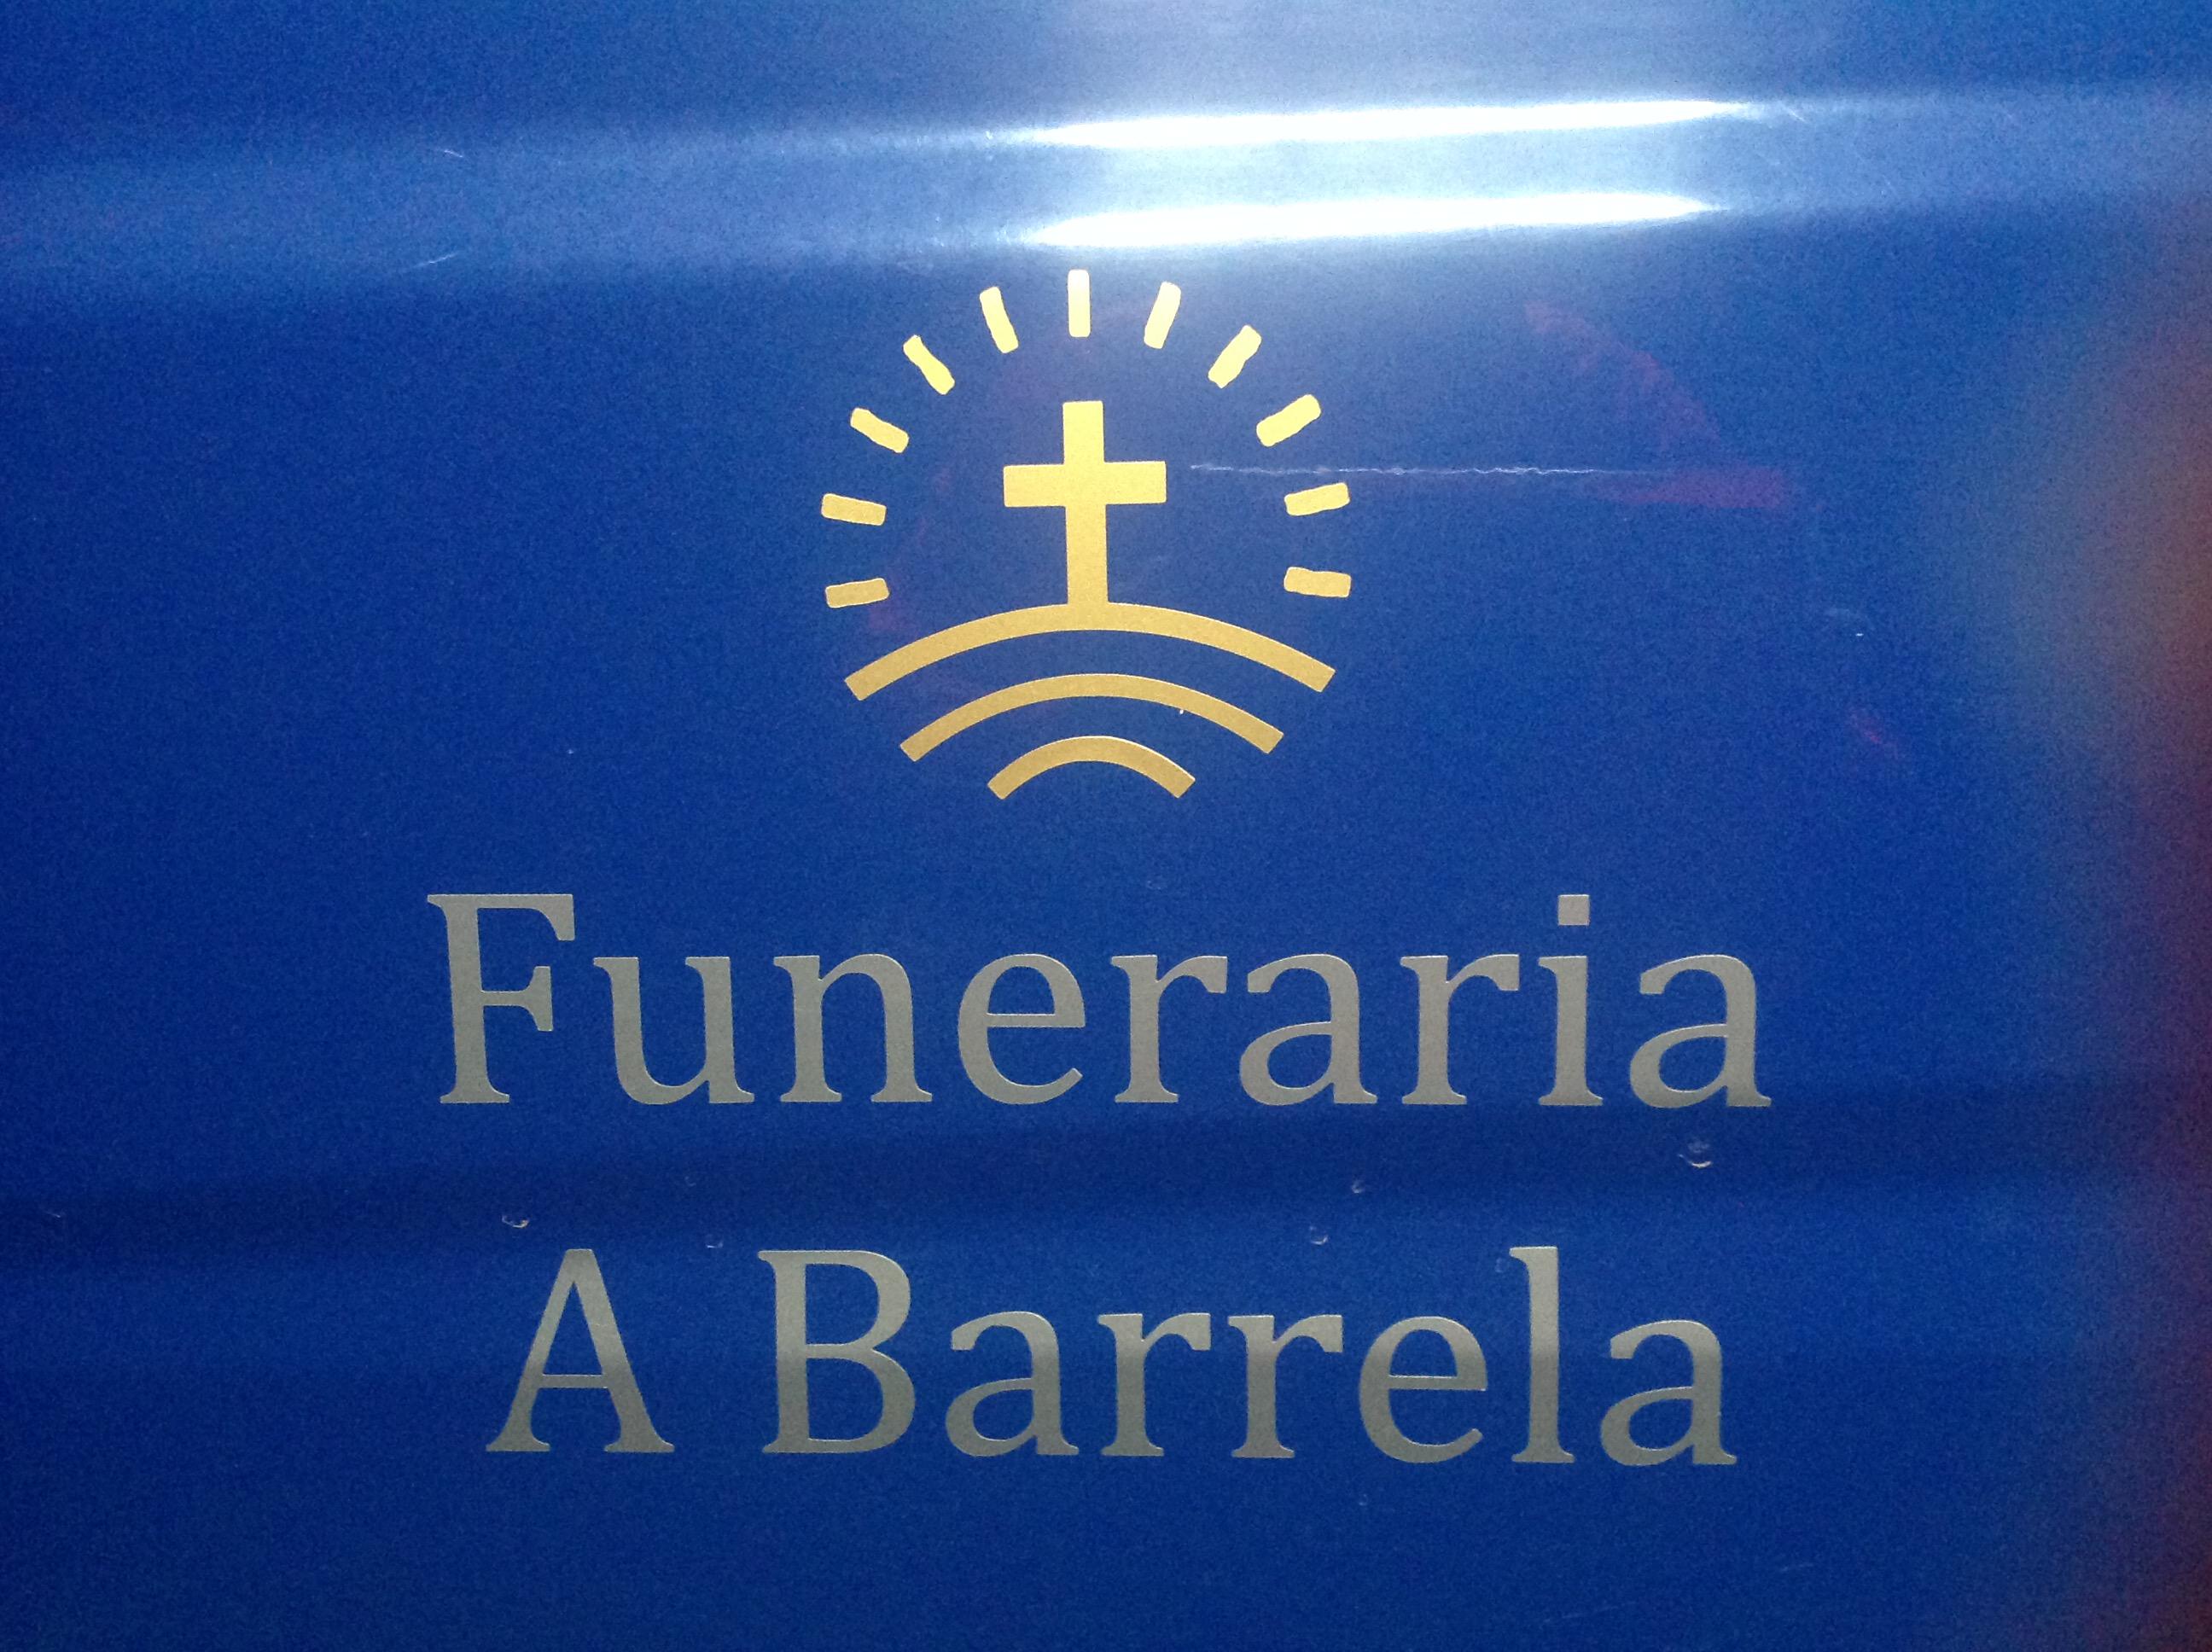 Funeraria Barrela